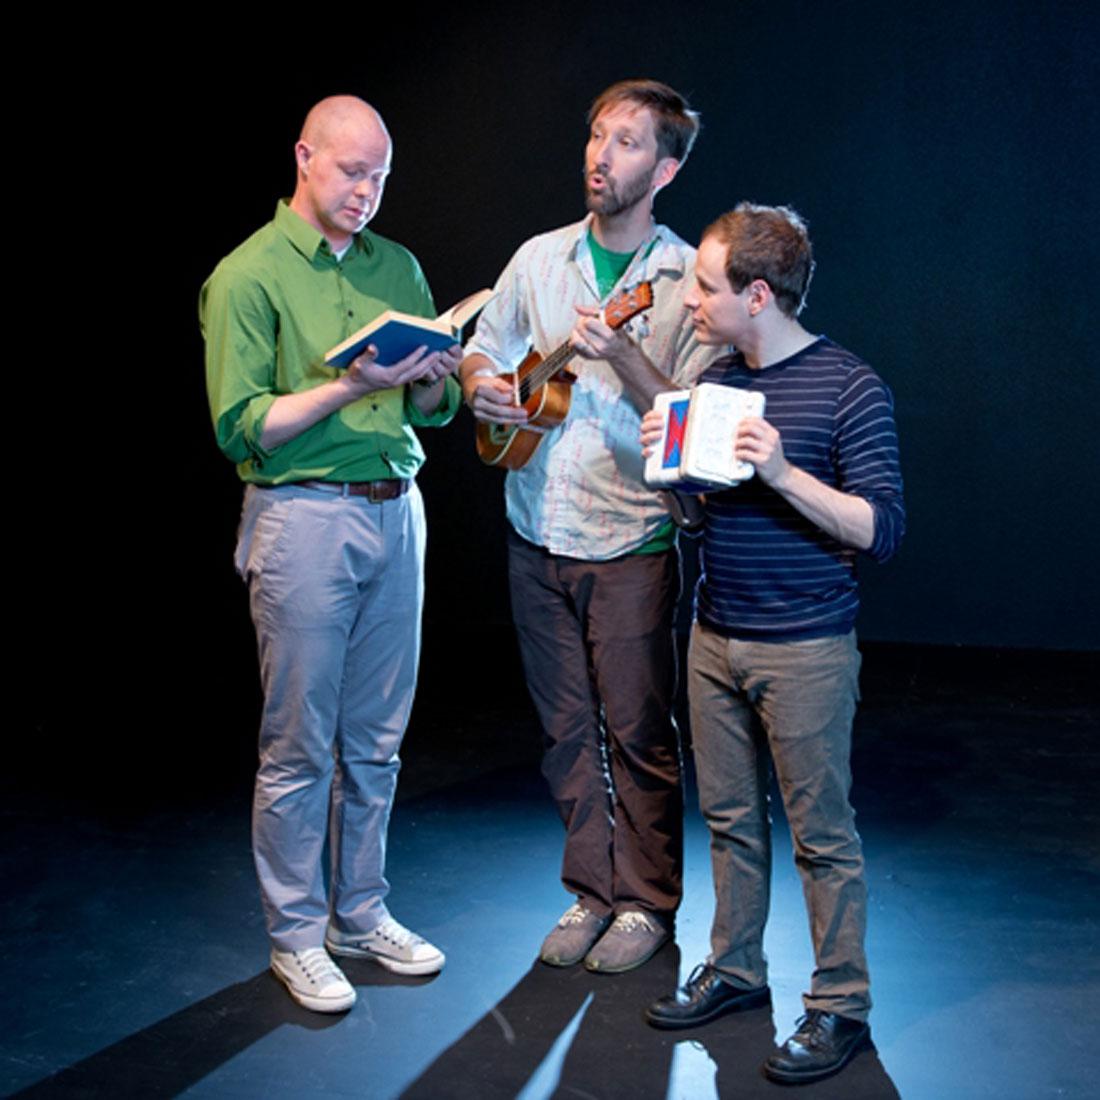 Luke Longacre, Brandon J. Murphy, and Scott Zenreich are an unholy yet hilarious trio in Amphibian's current production.